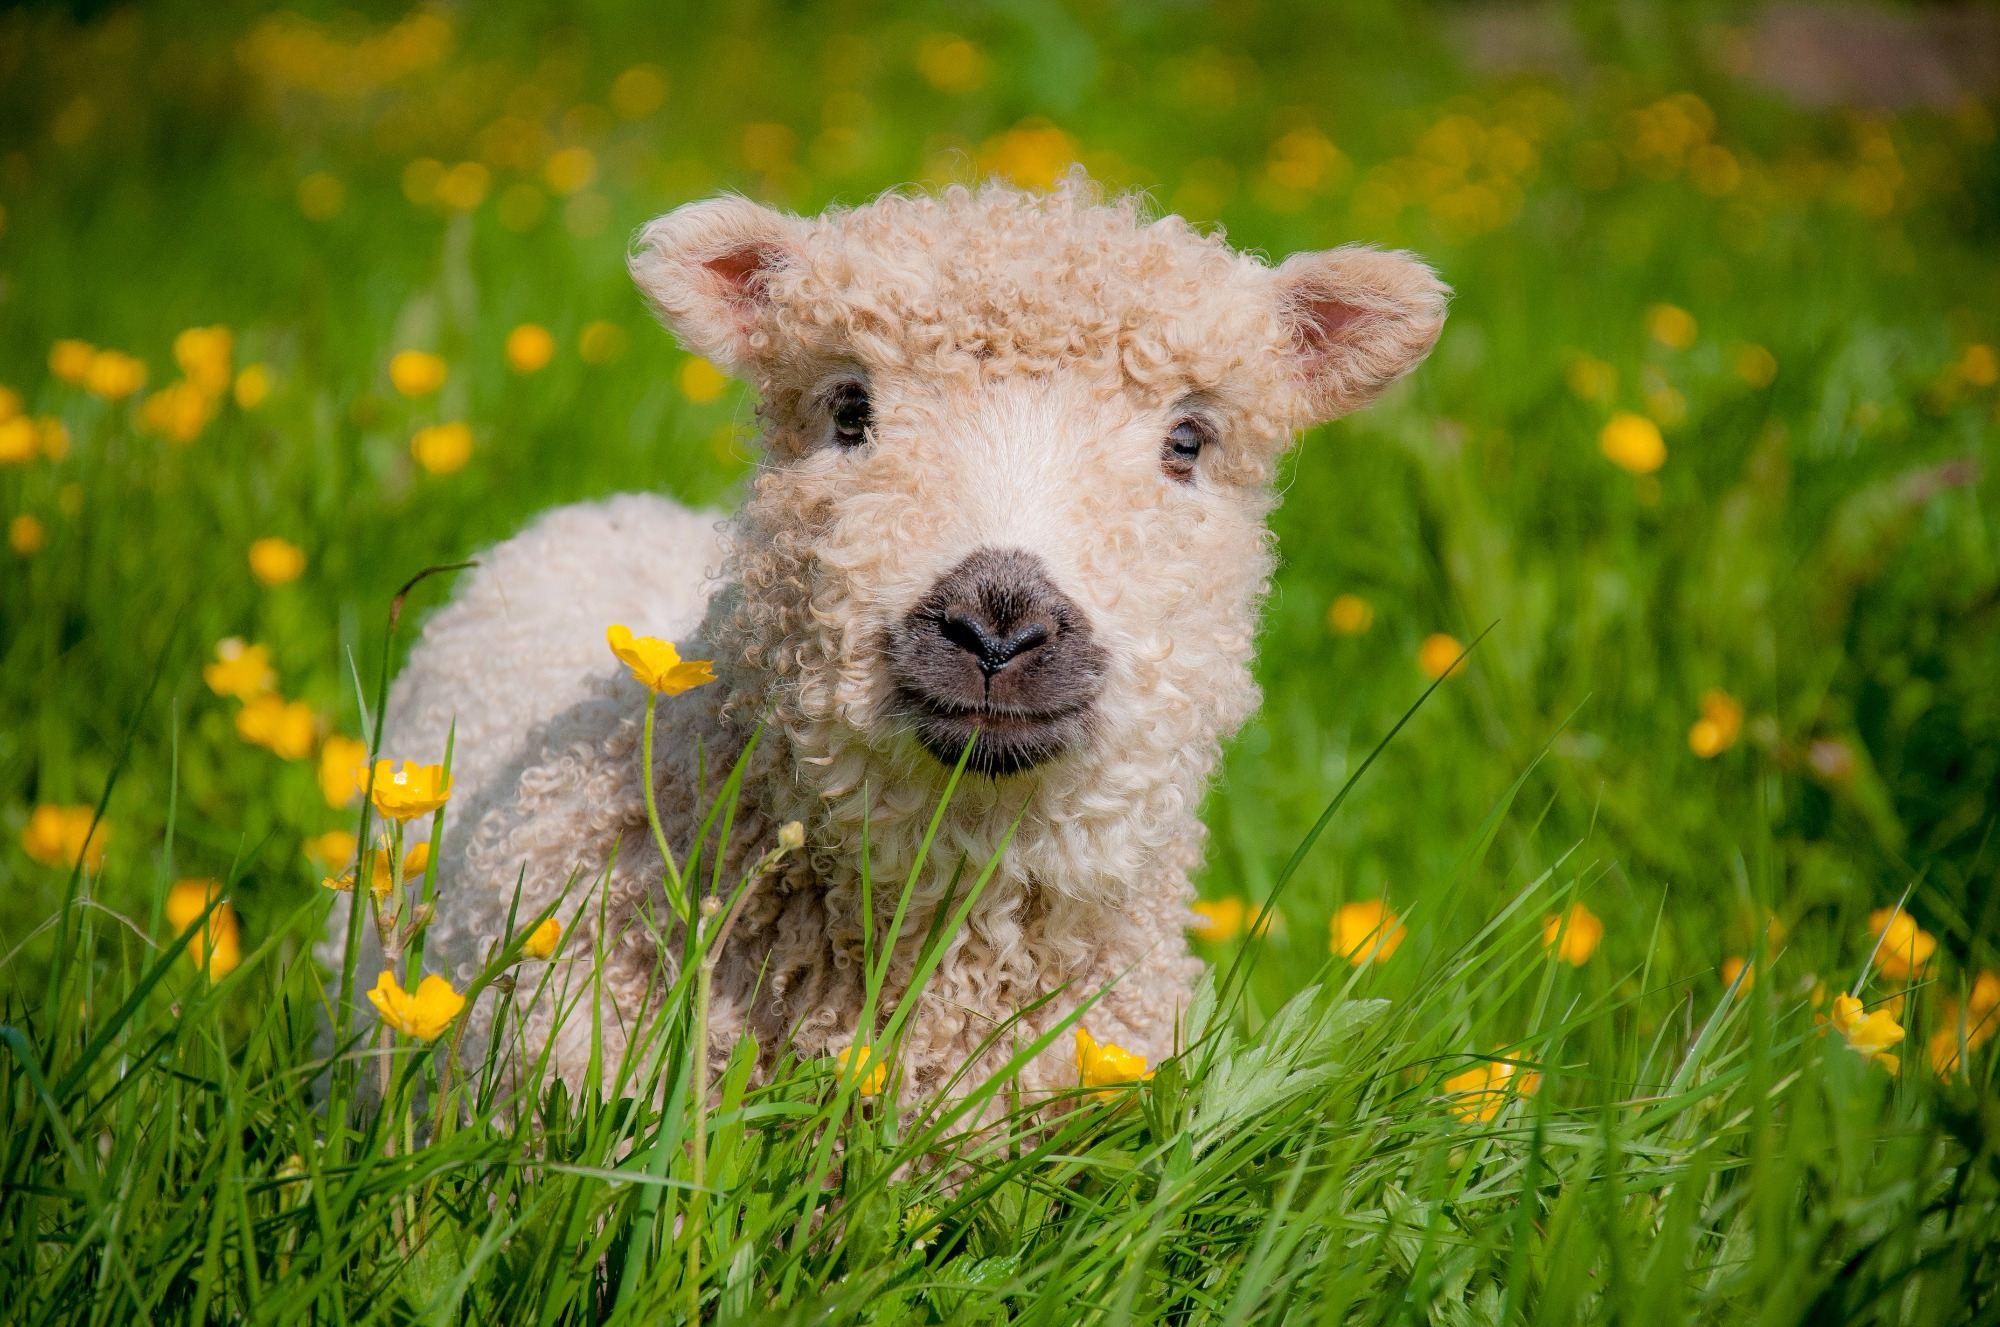 Greyface Dartmoor Lamb. Greeting Card